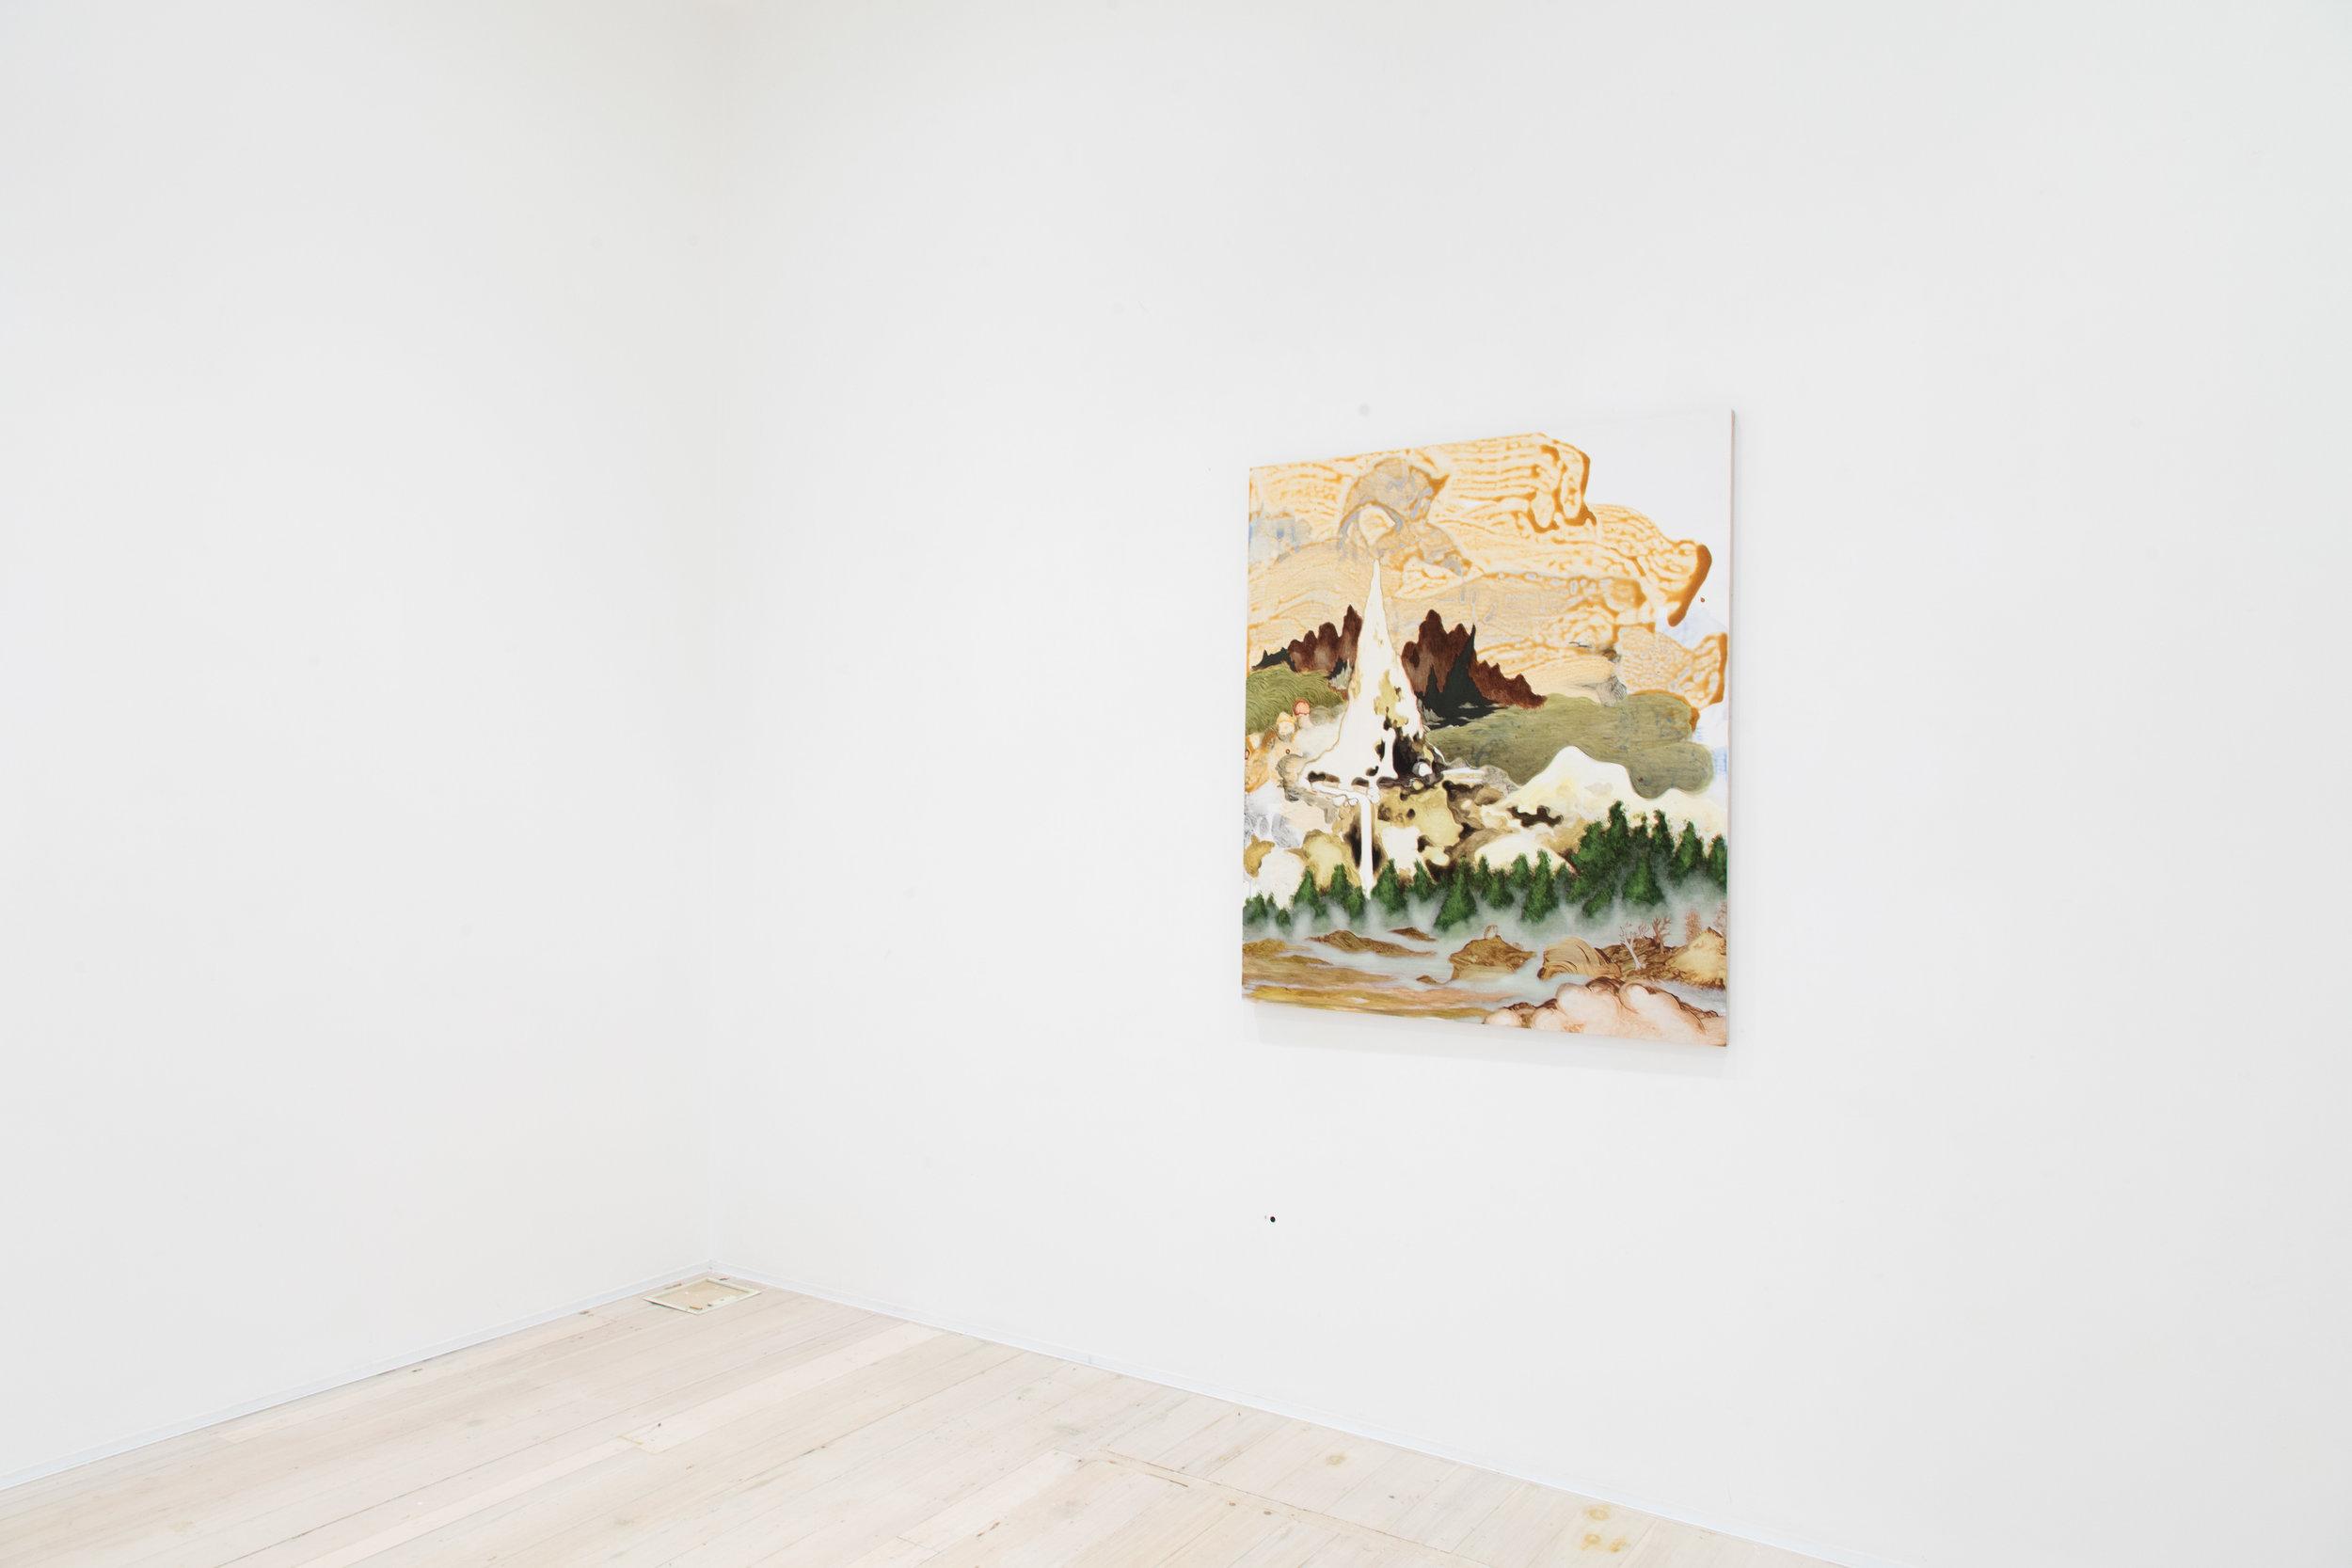 Installation view of Mark Rodda's painting